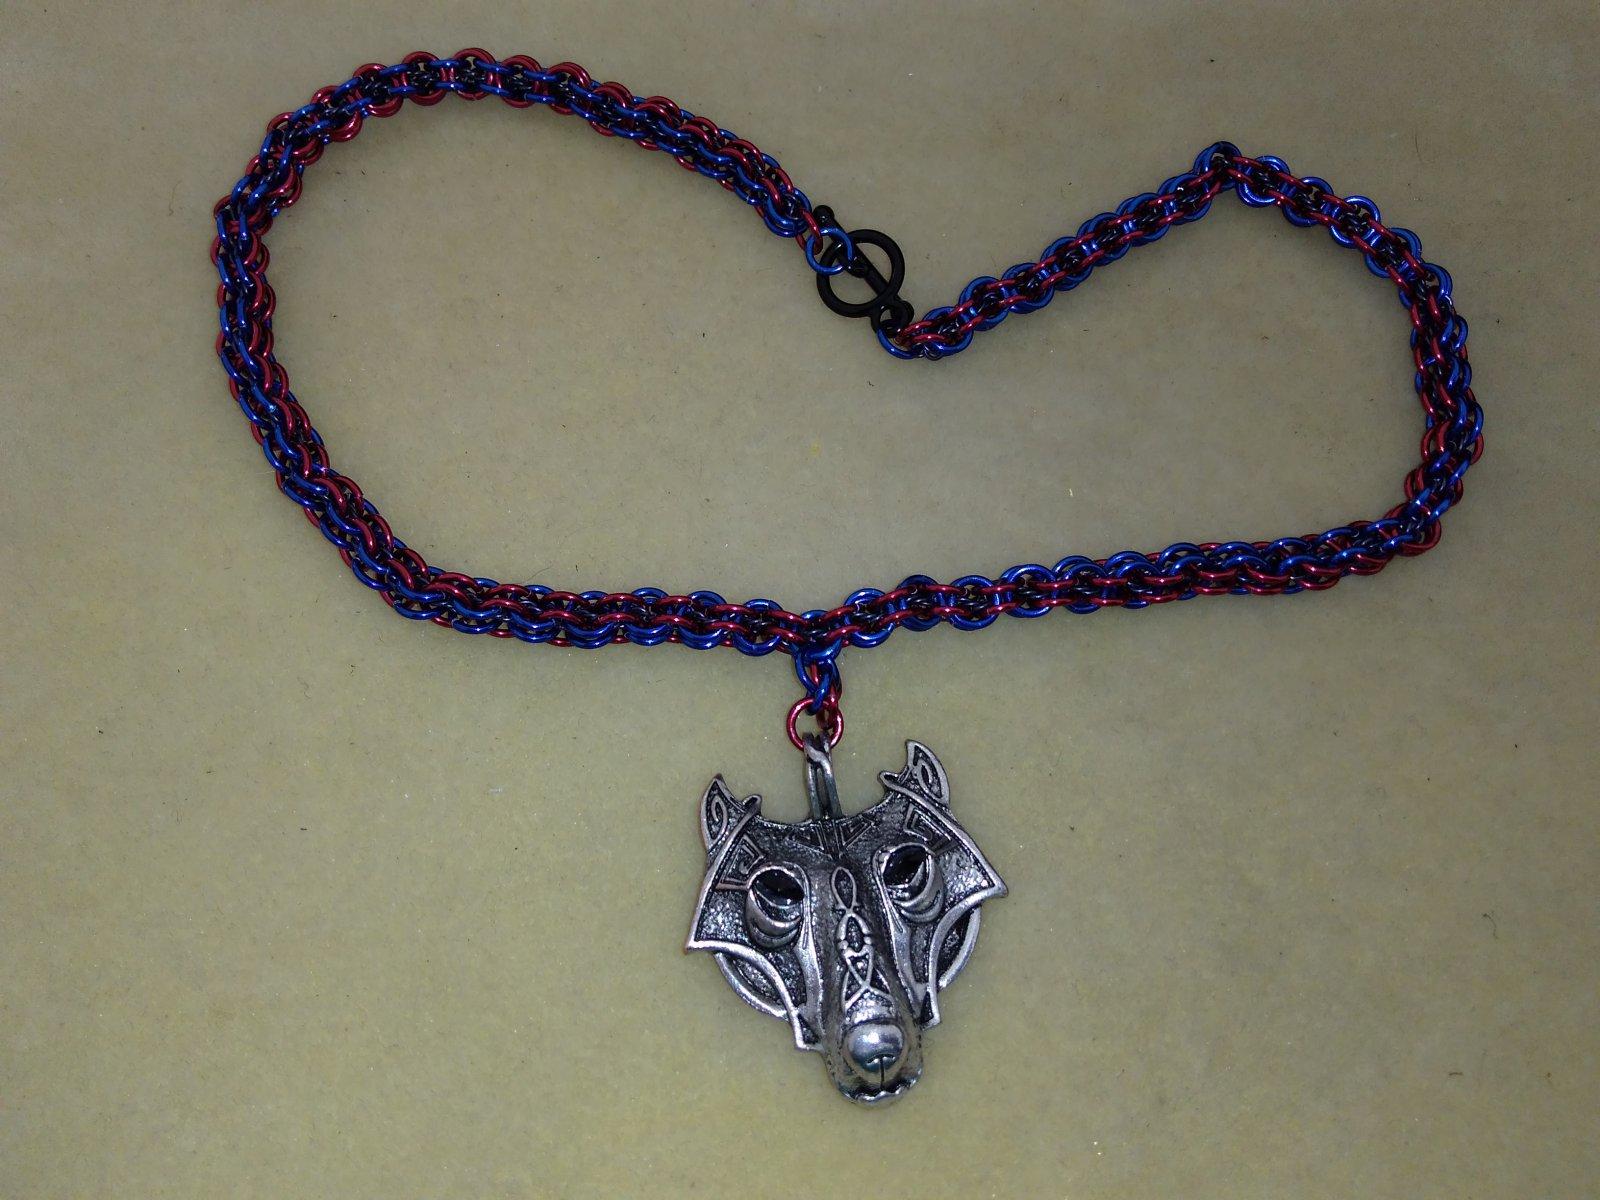 Embedded spiral necklace